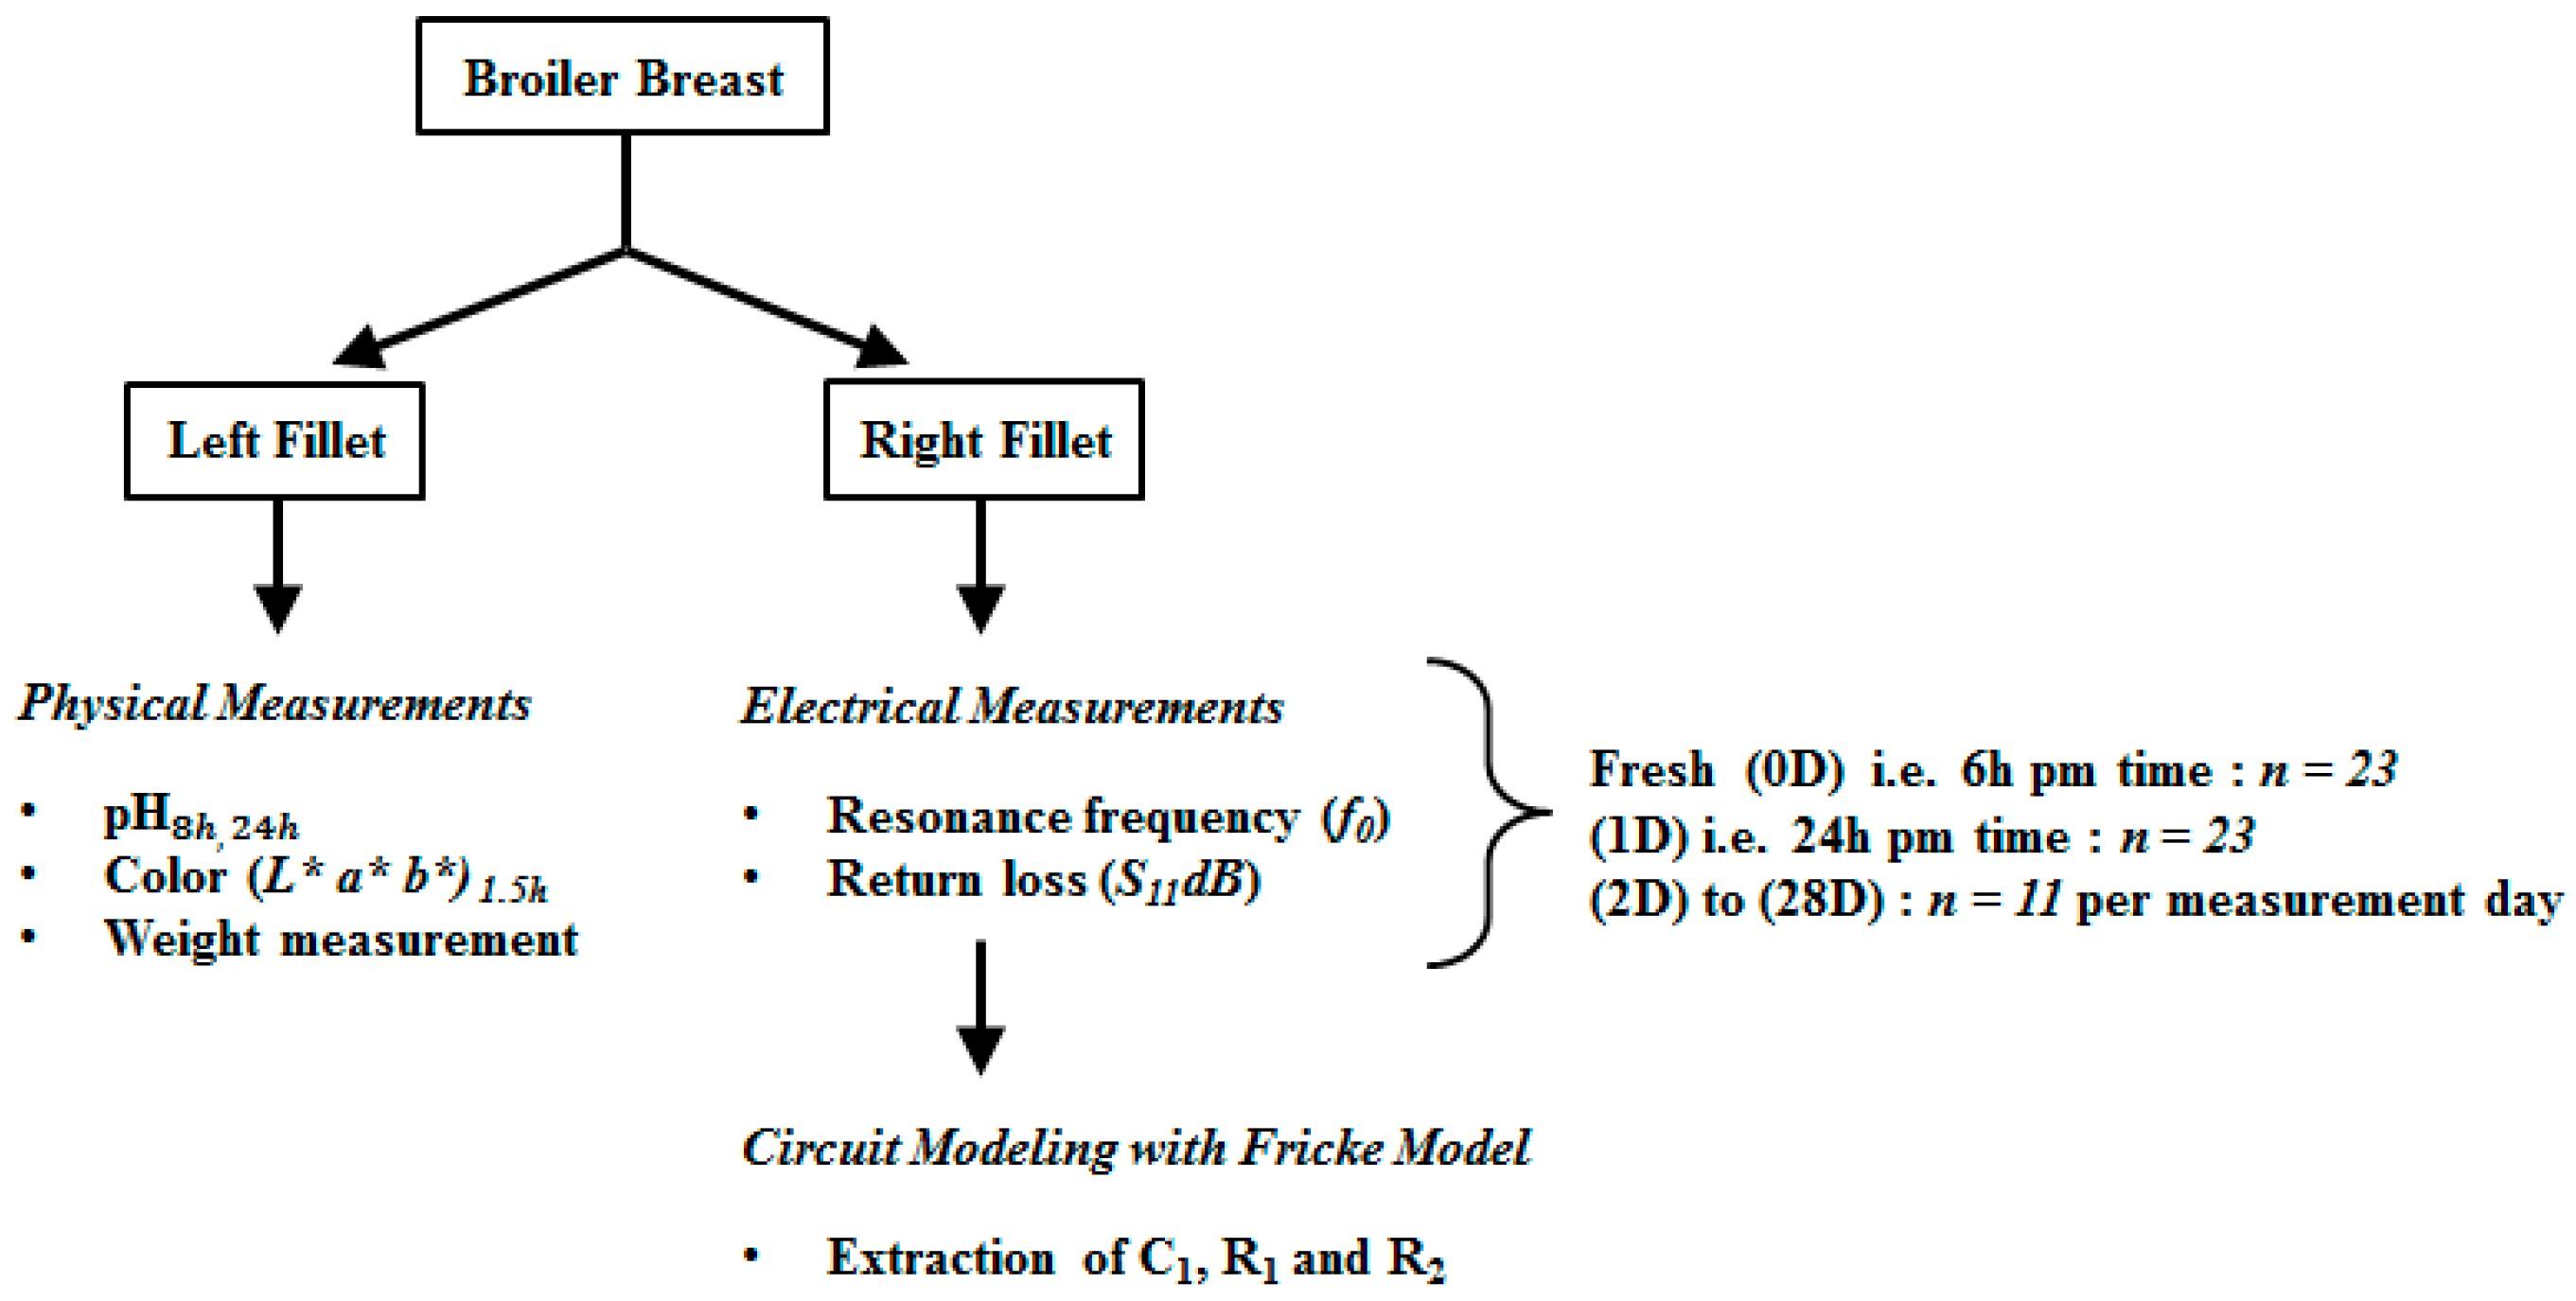 Radiator System Diagram Sensors Free Full Text Of Radiator System Diagram